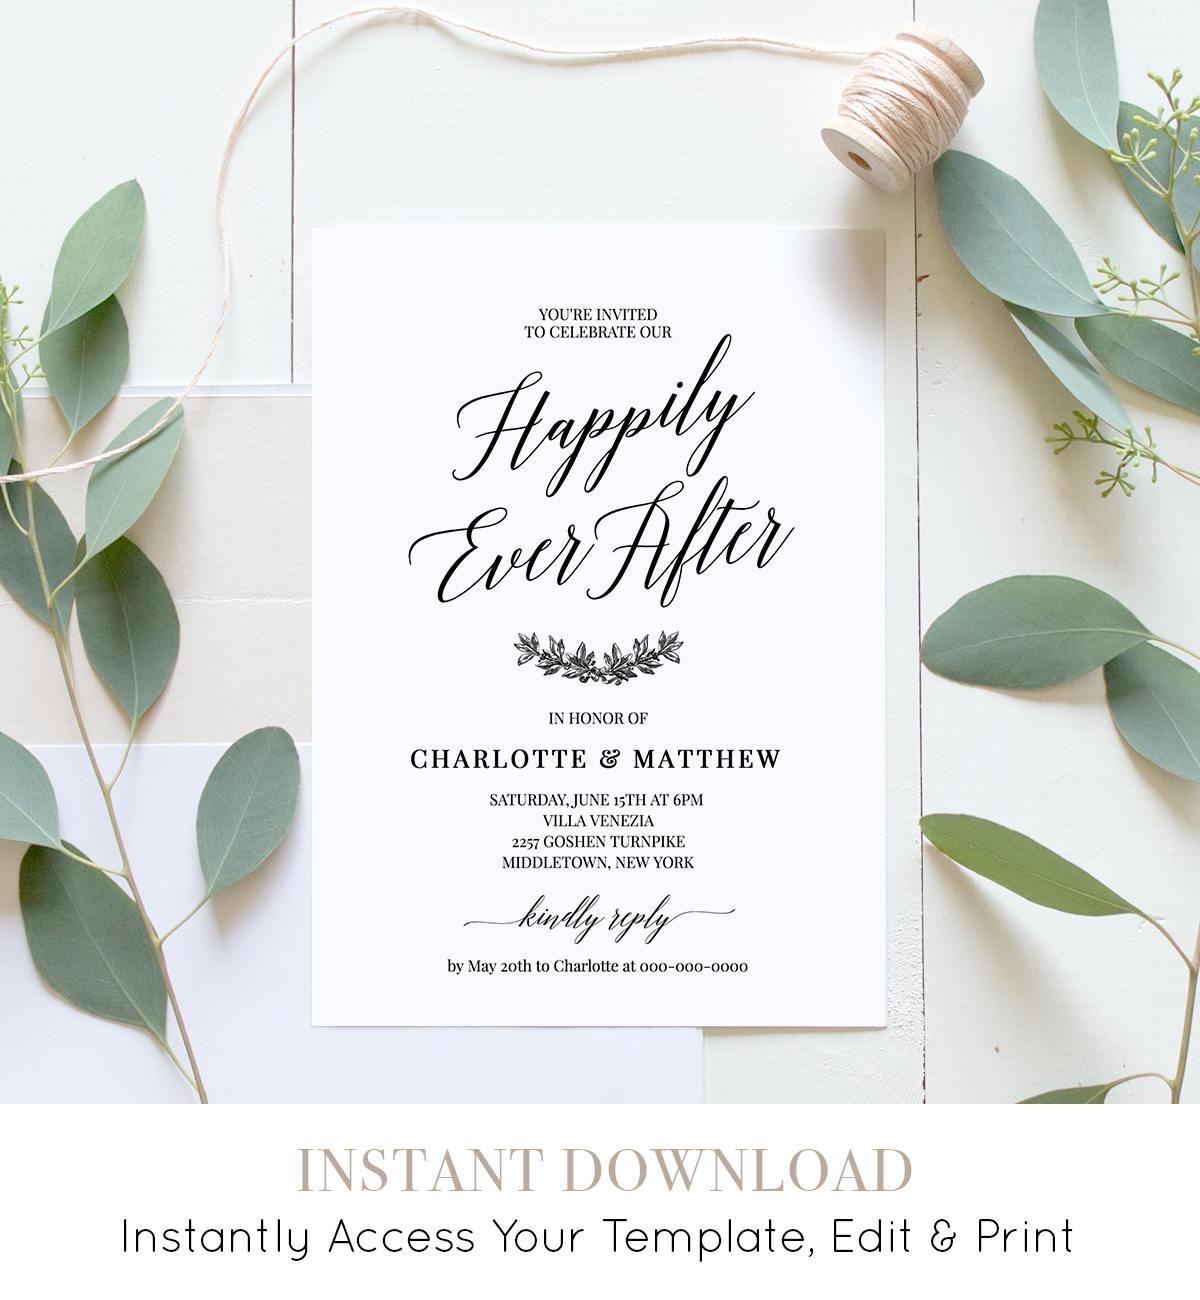 Reception After Destination Wedding Invitation: Wedding Reception Party Invitation, Post Wedding